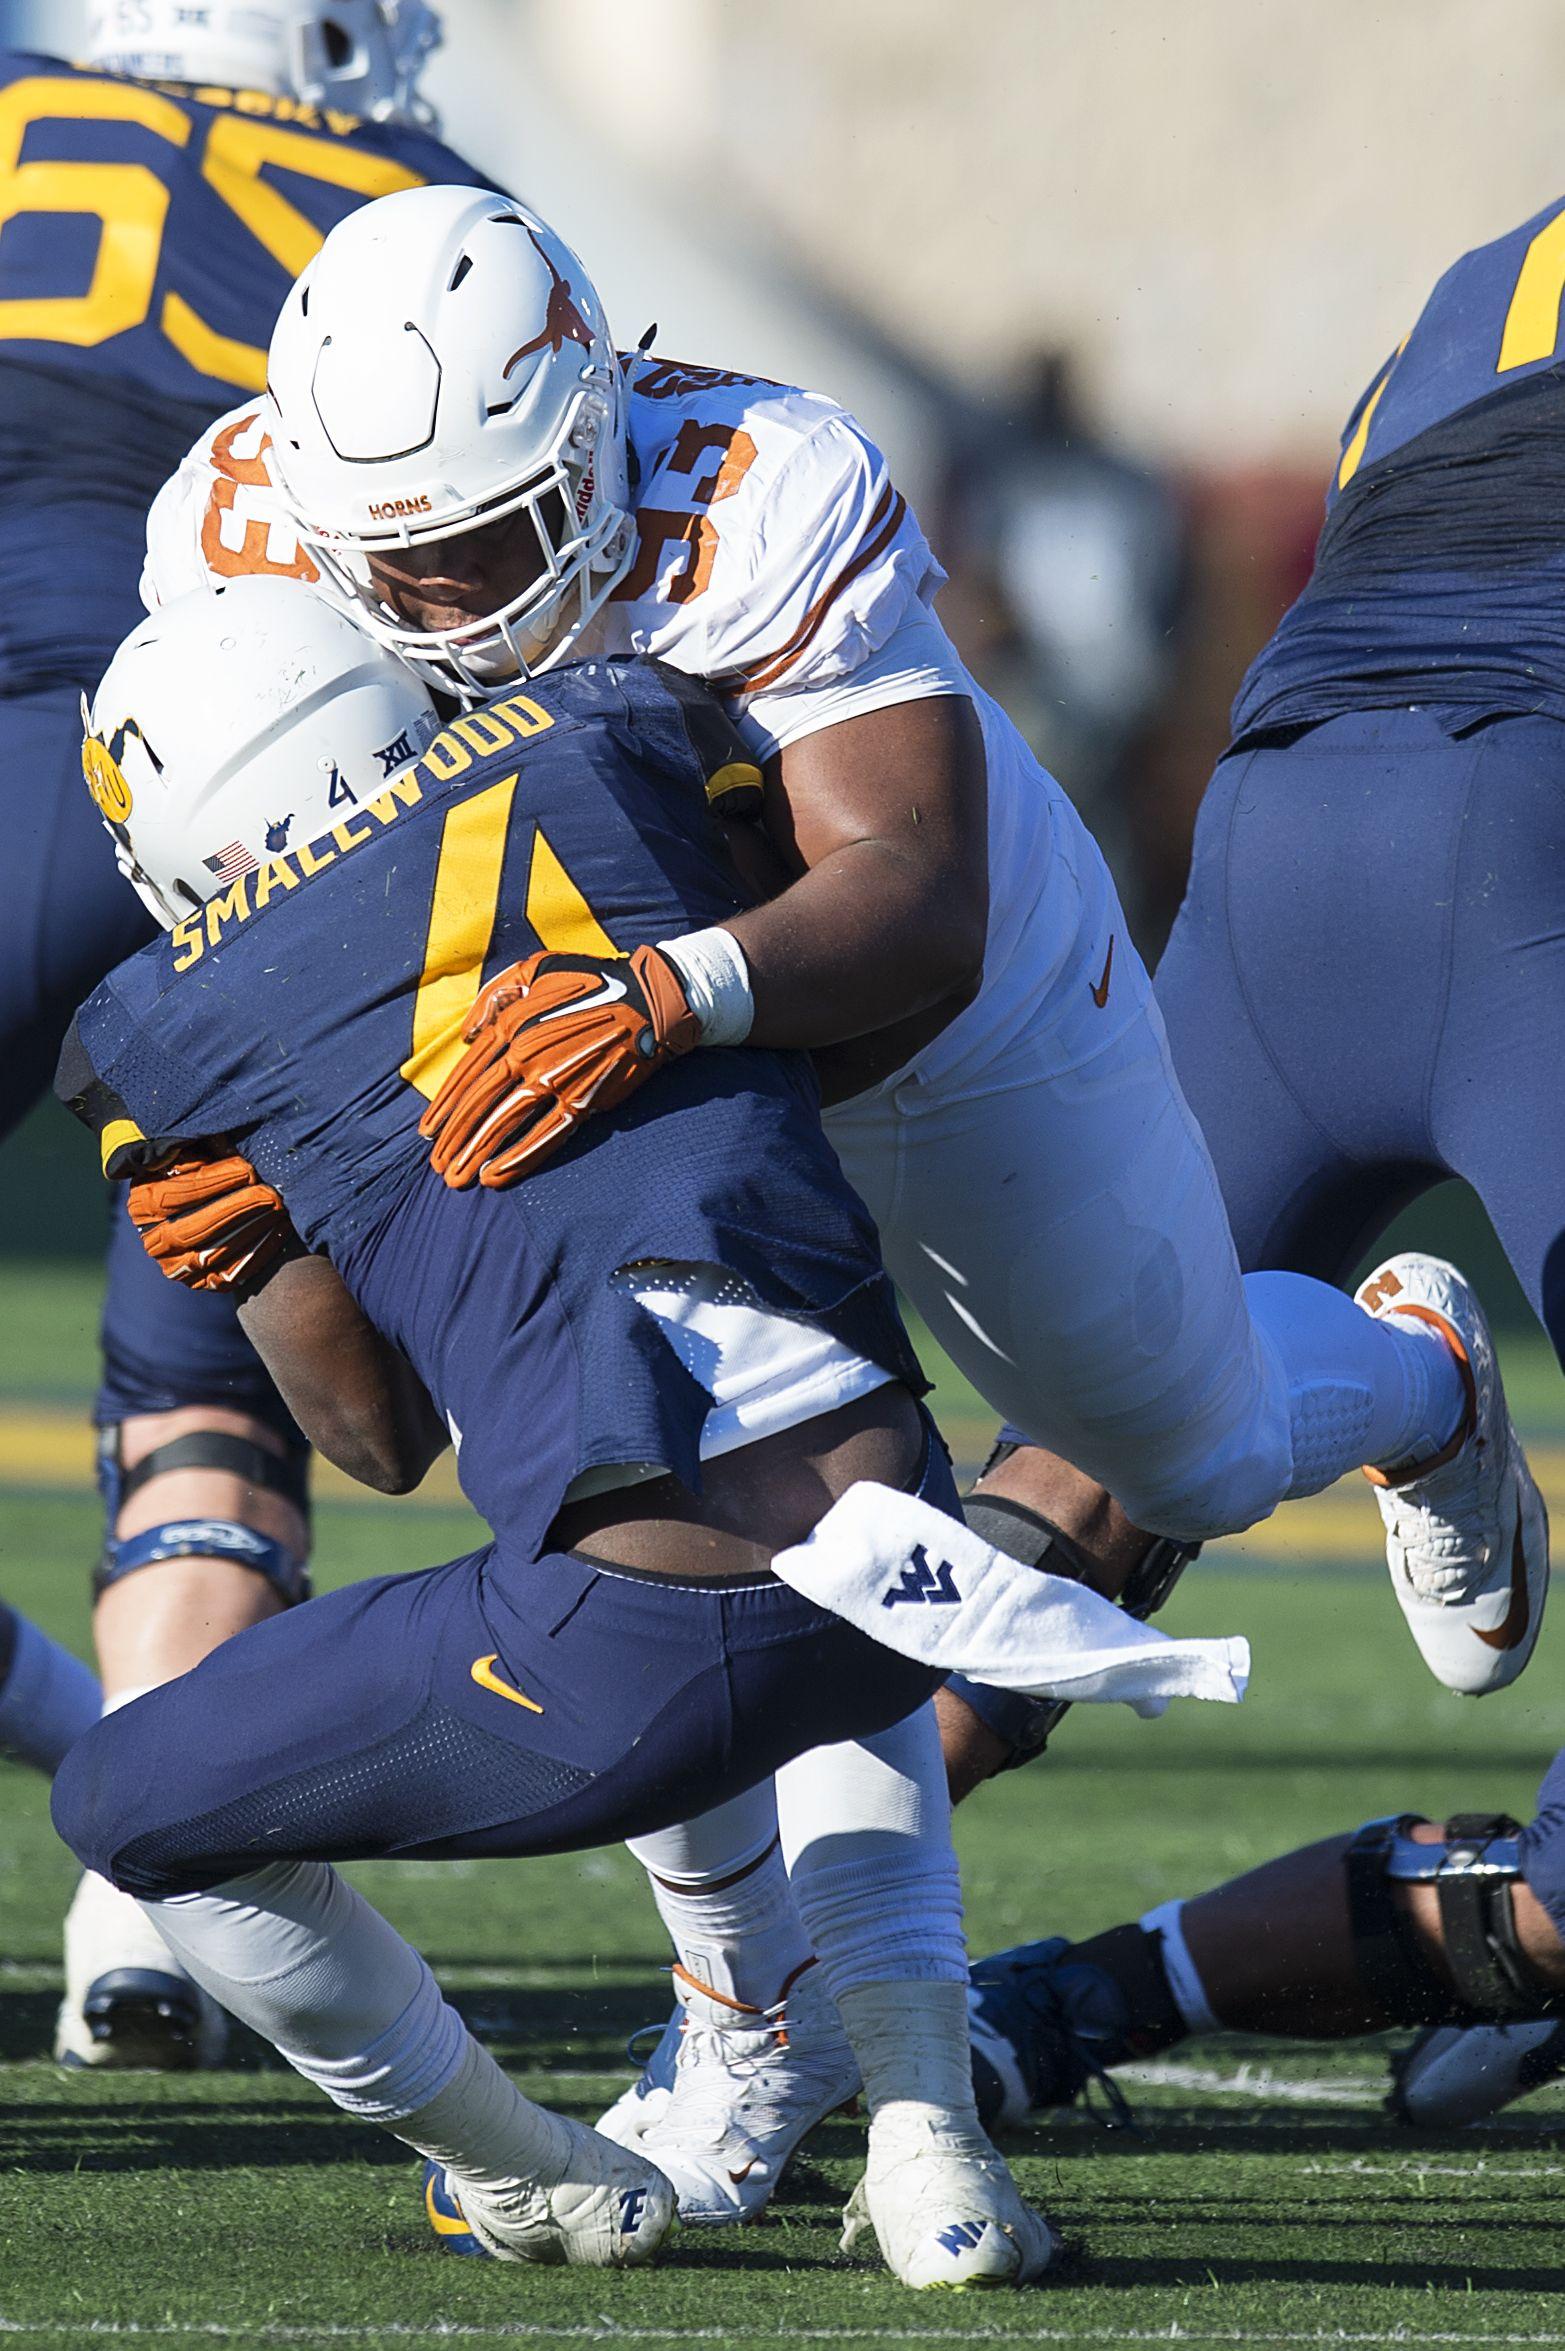 DT Paul Boyette, Jr. Texas football, University of texas